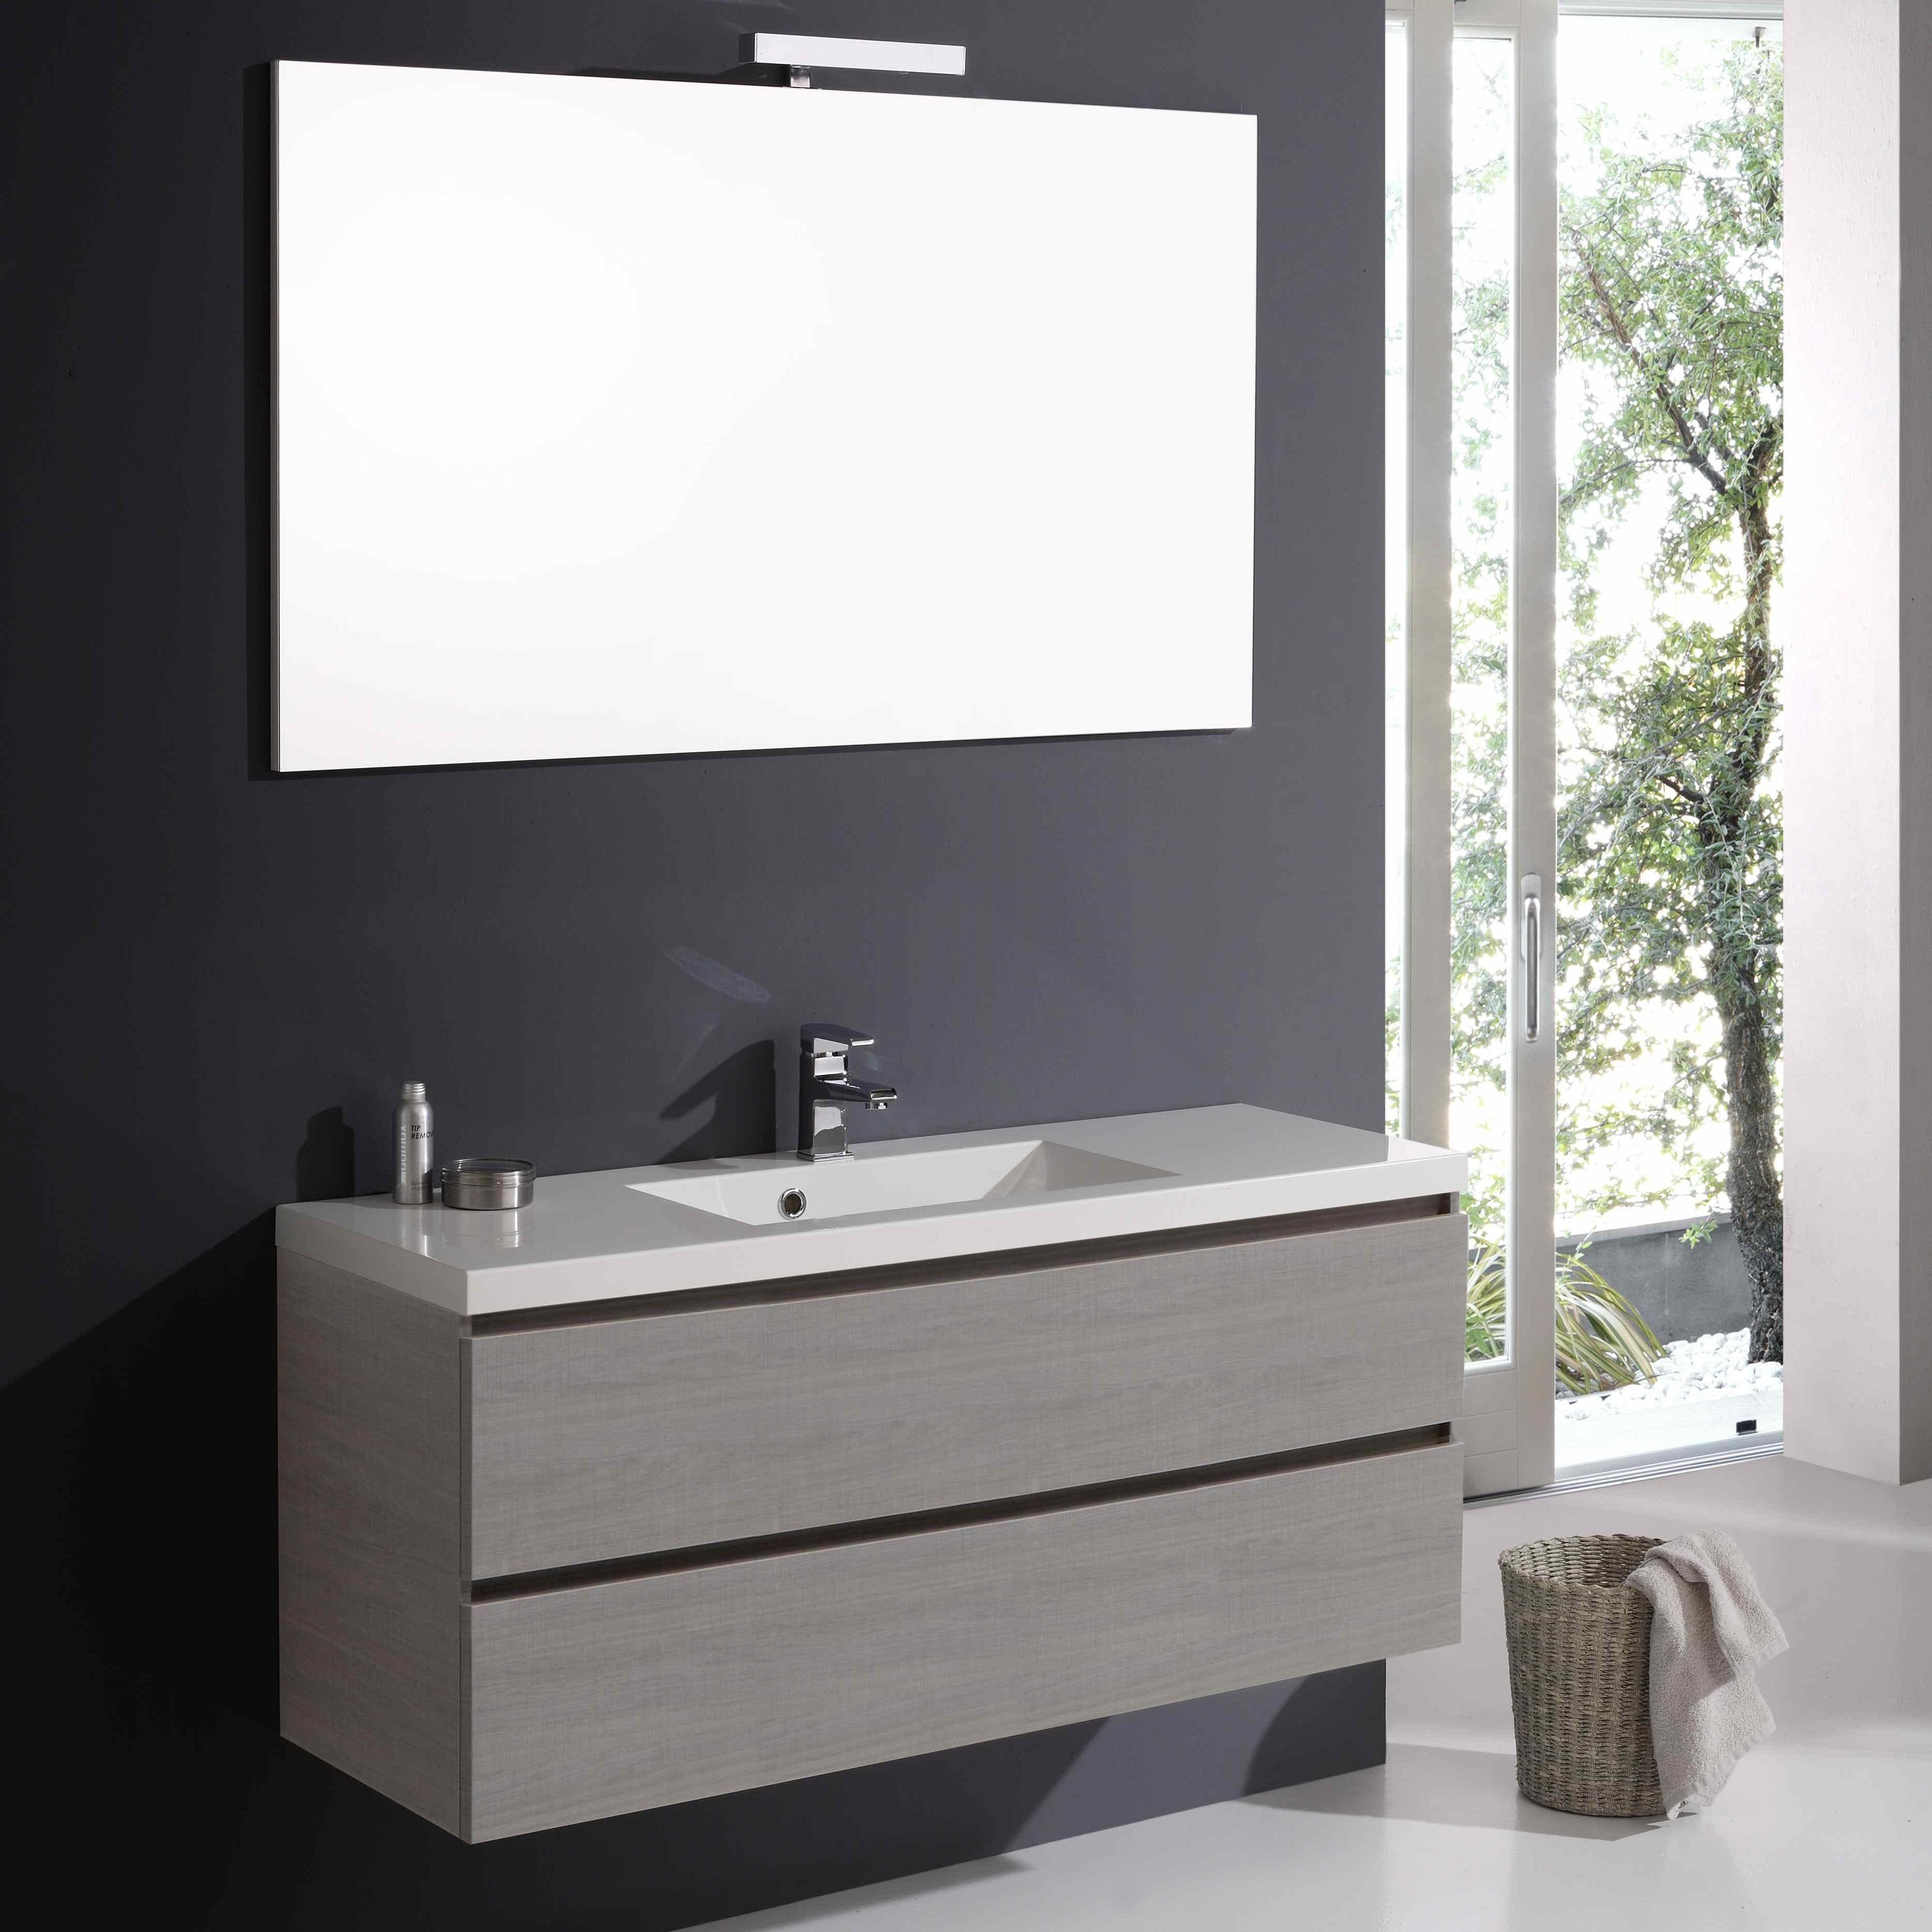 Mobili bagno deghi mobili bagno deghi with mobili bagno for Web mobili outlet